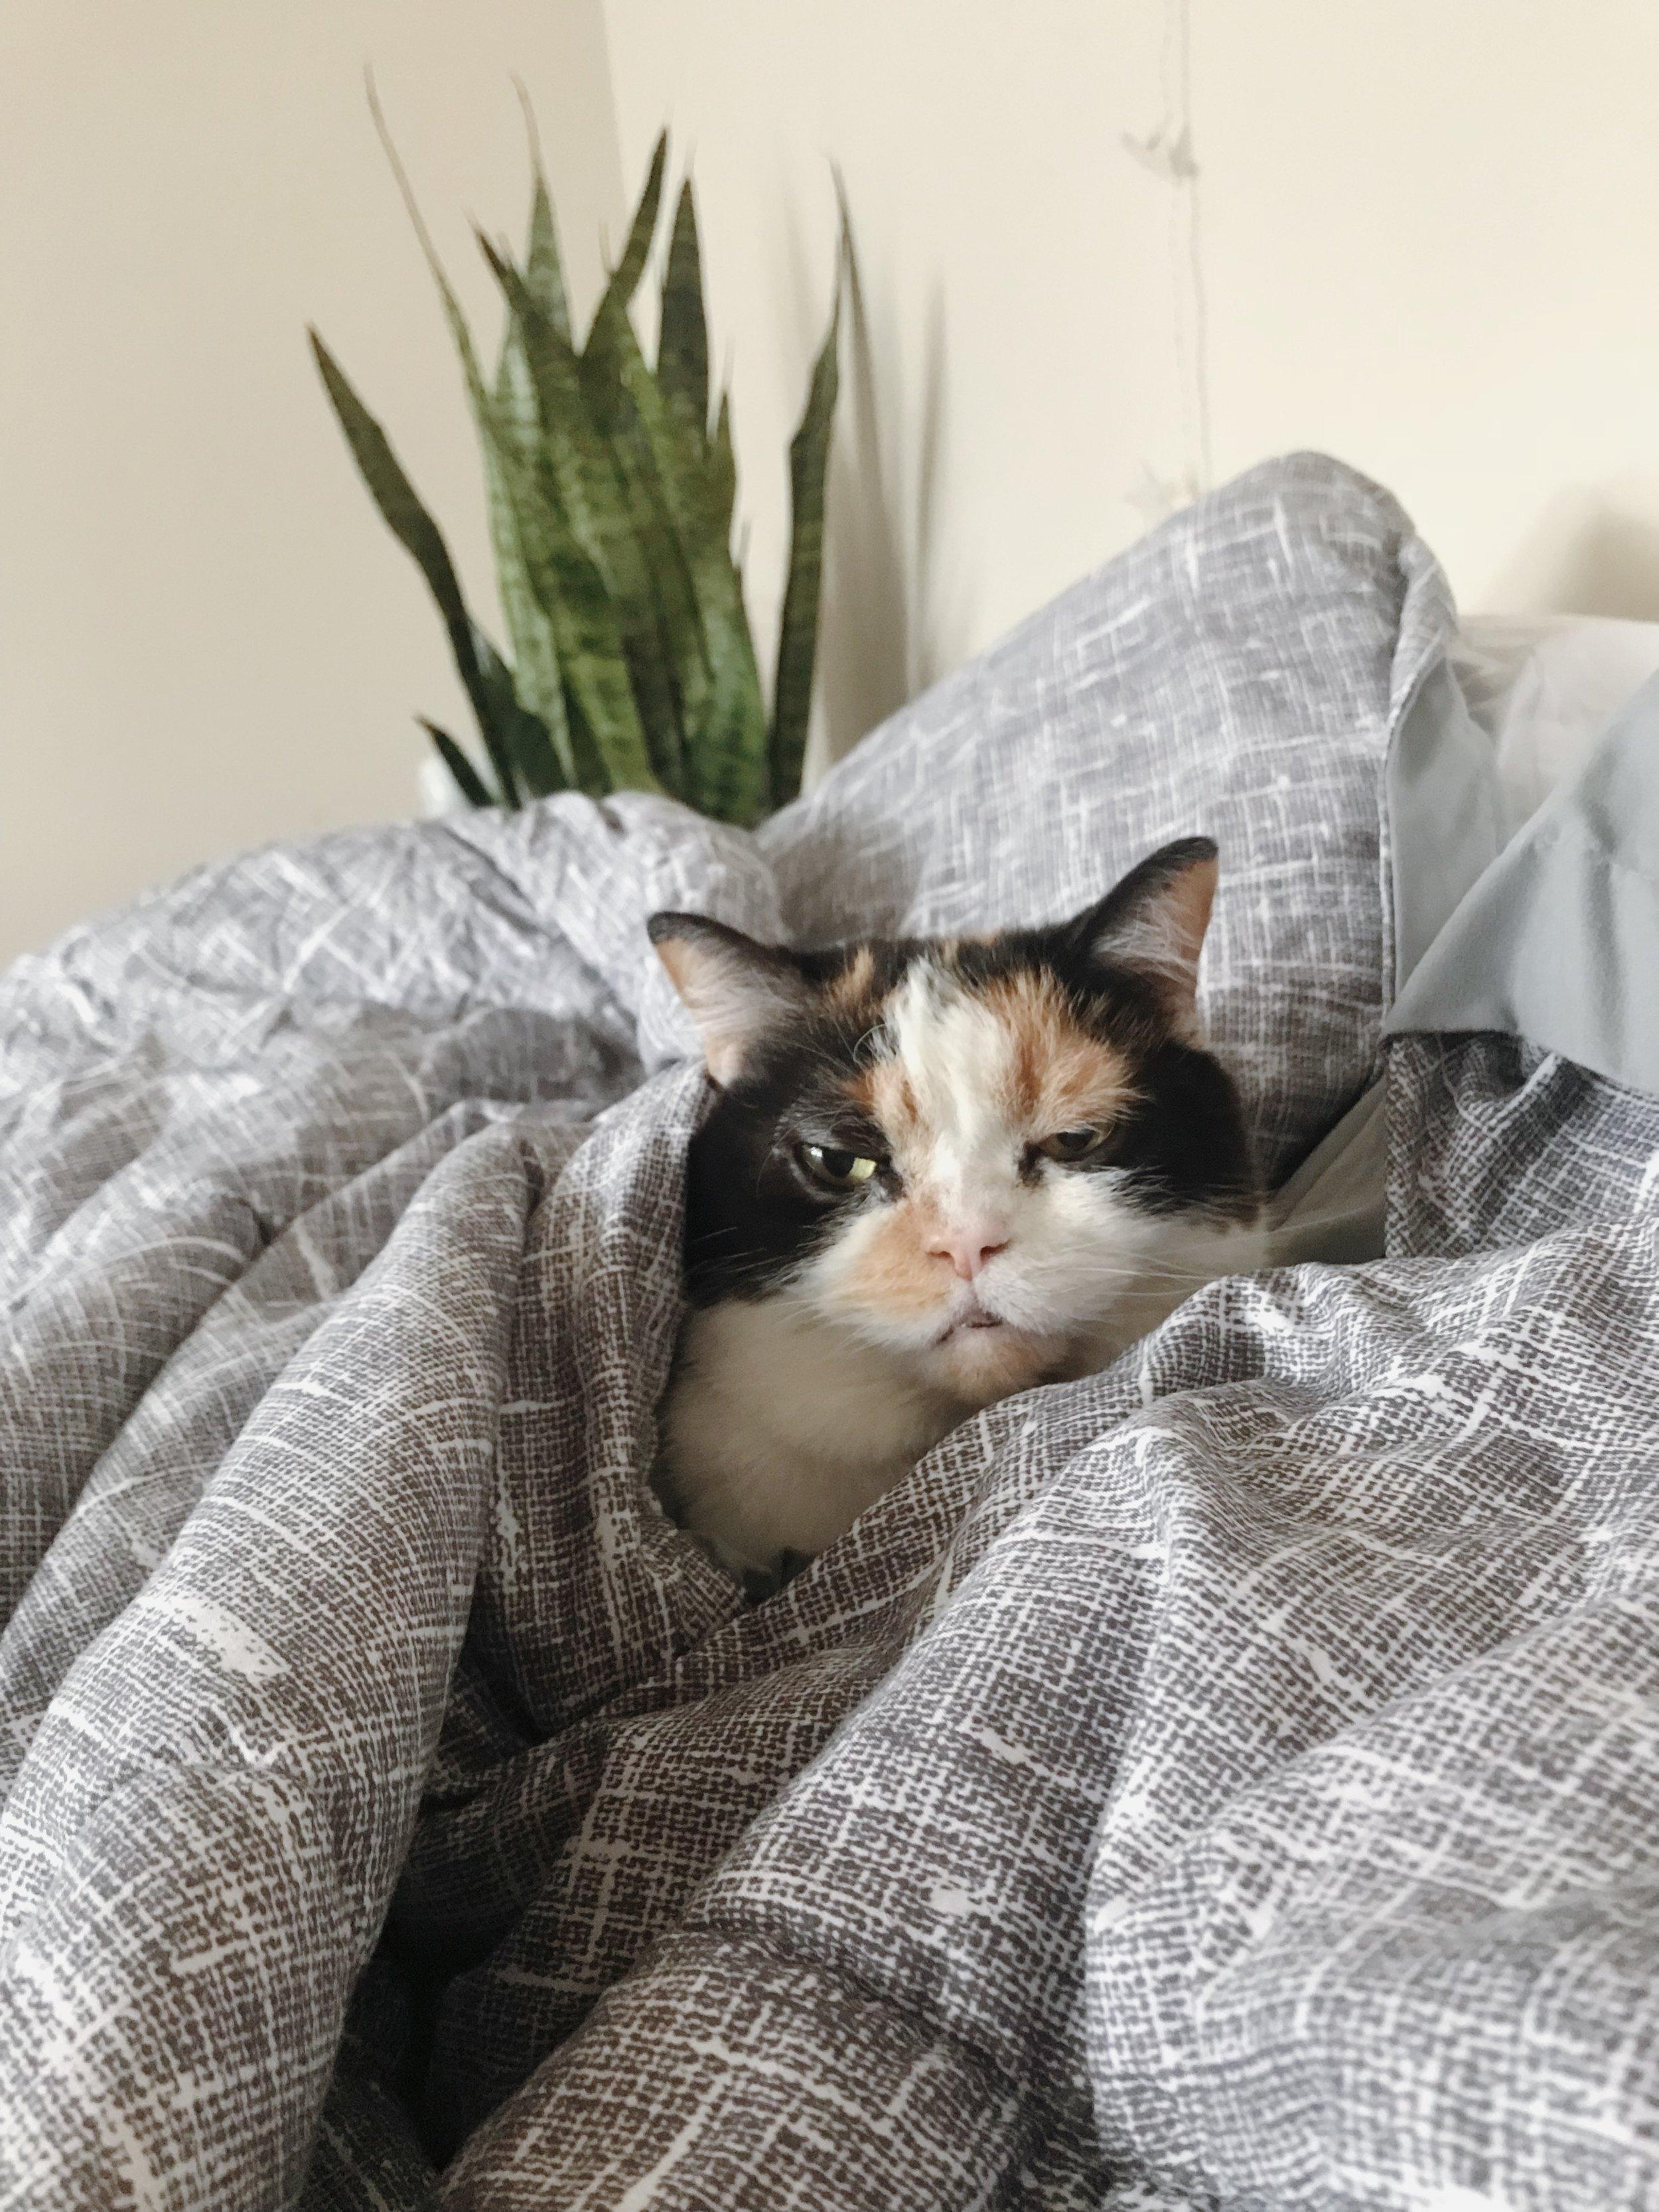 Murphy being grumpy from being woken up